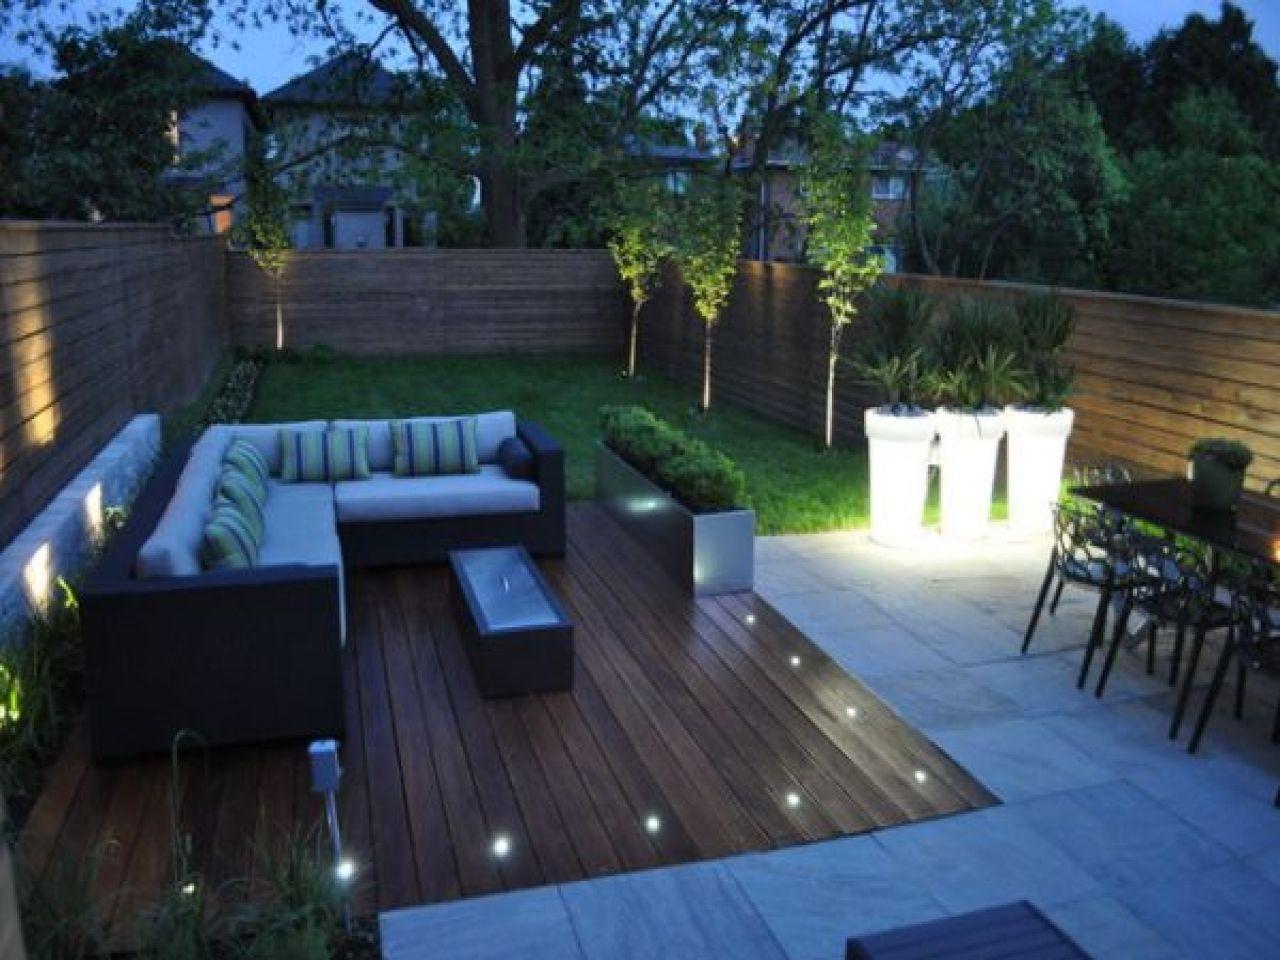 Modern Backyard Deck Design Ideas Back Yard Decks Daa7c59a3158701b 1280x960